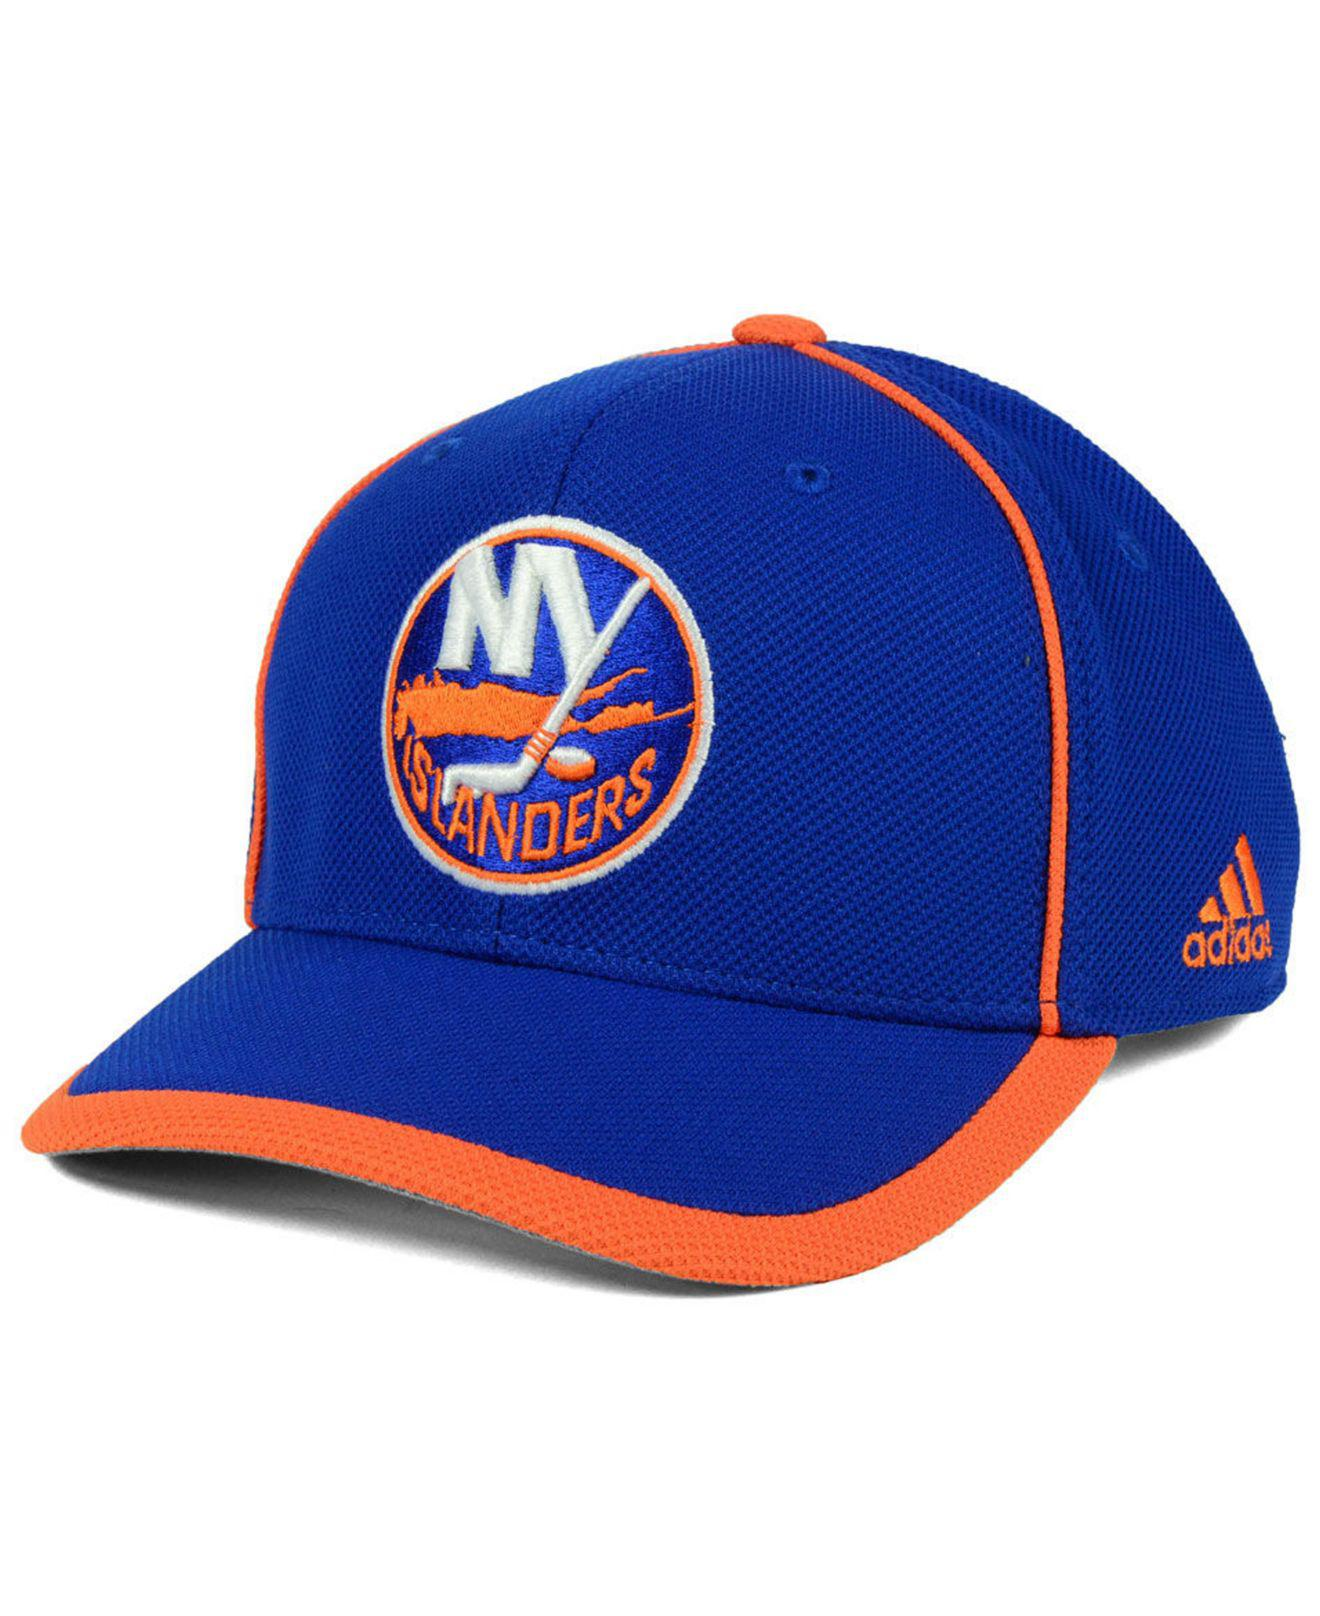 Lyst - Adidas New York Islanders Clipper Adjustable Cap in Blue for Men 15ef354cce9